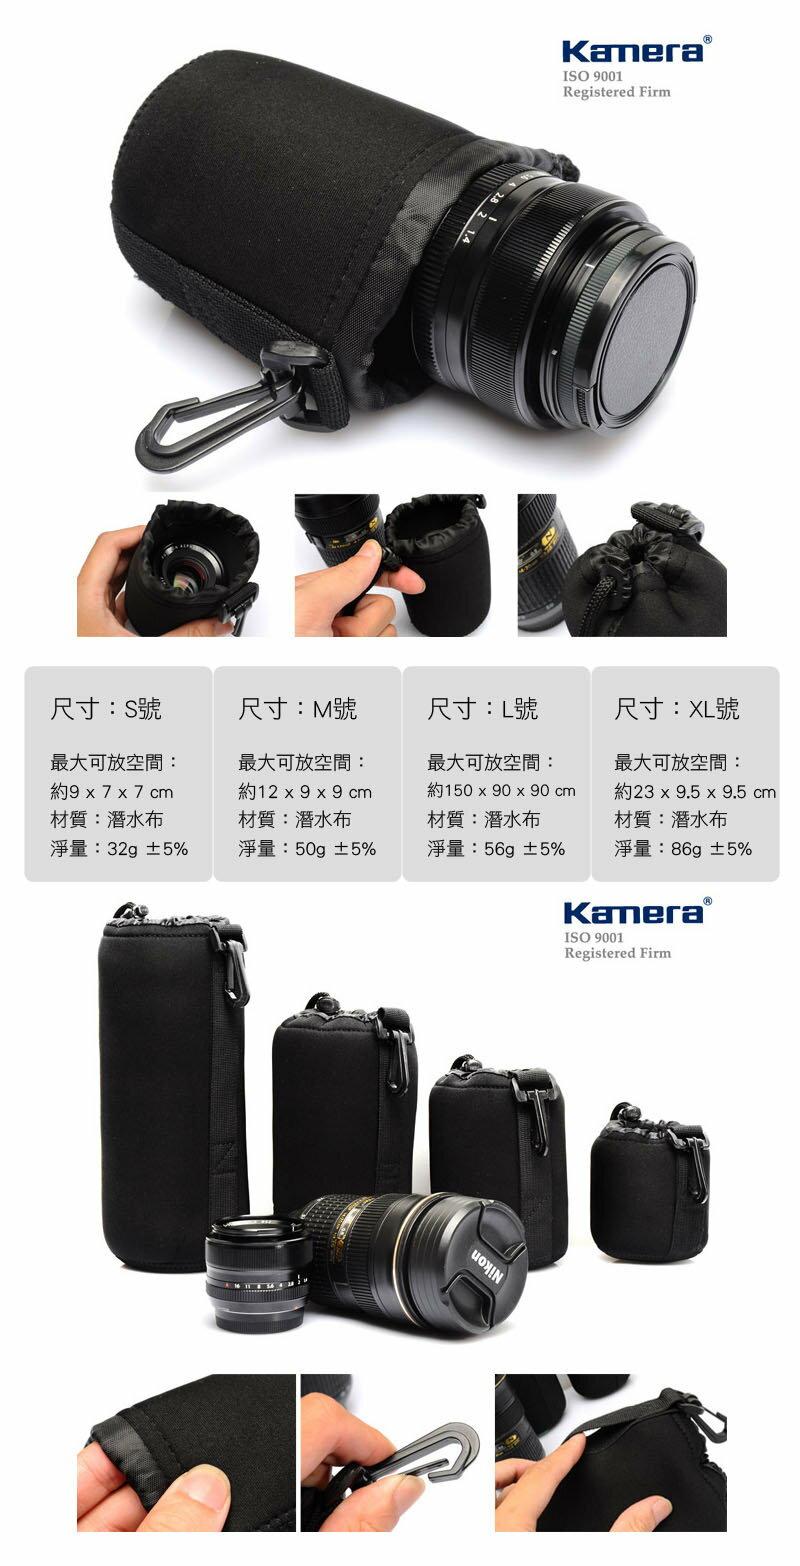 Kamera 佳美能 潛水料鏡頭袋 M 中 12x9 鏡頭袋 鏡頭筒 保護套 包布 防水防撞 彈性 保護袋 潛水布材質 0